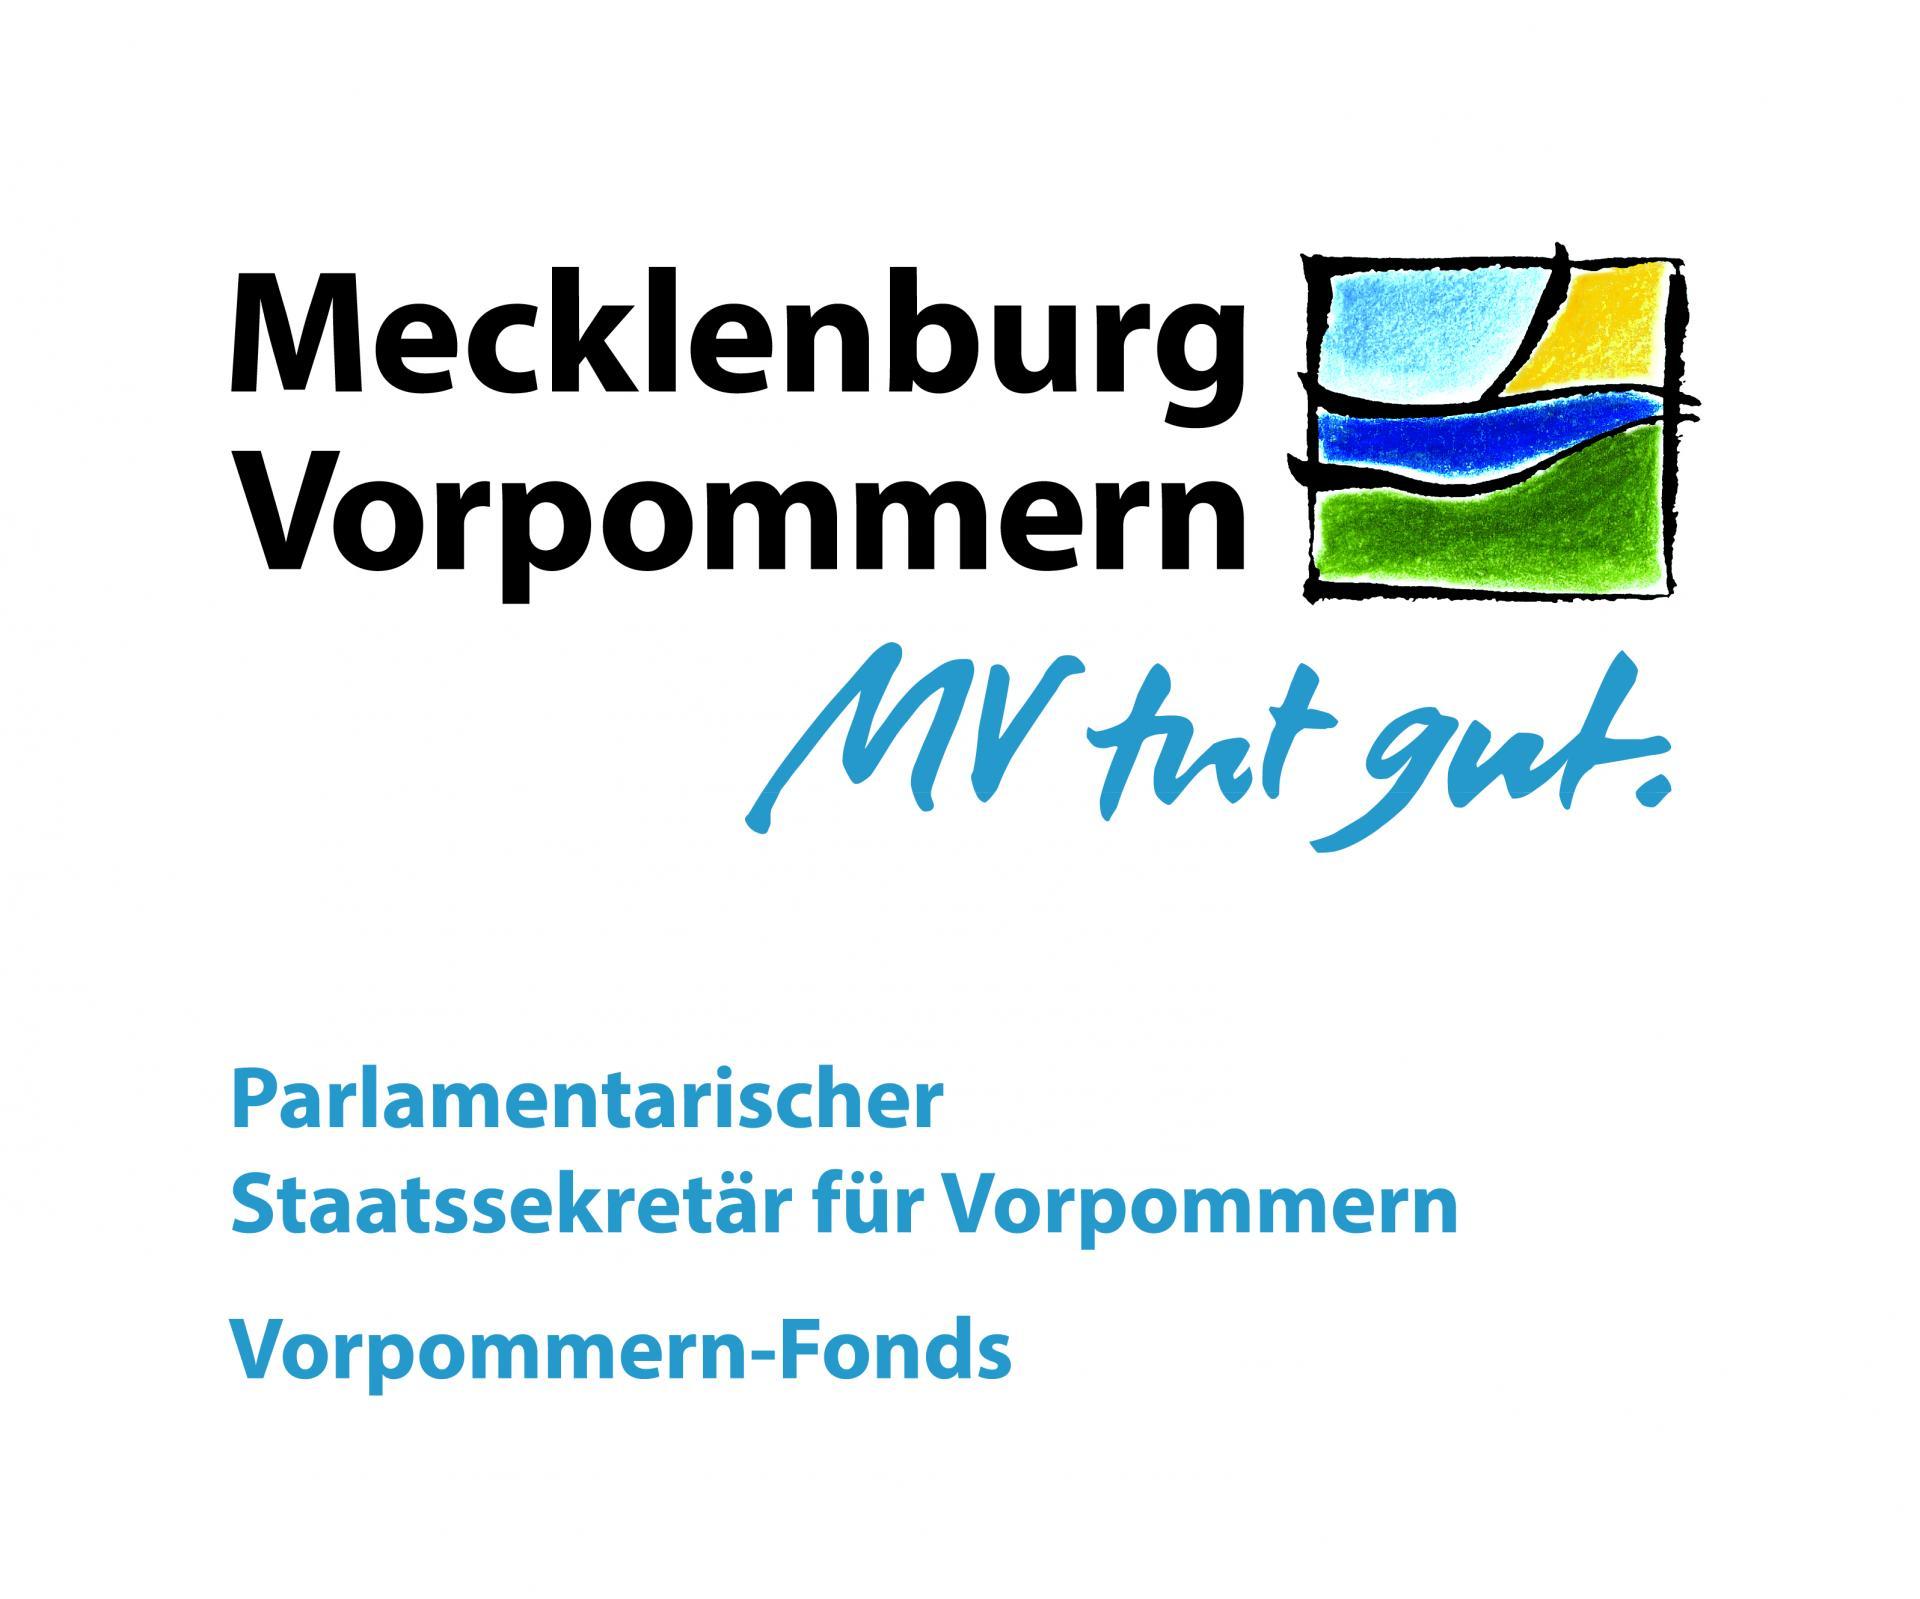 Vorpommern Fond